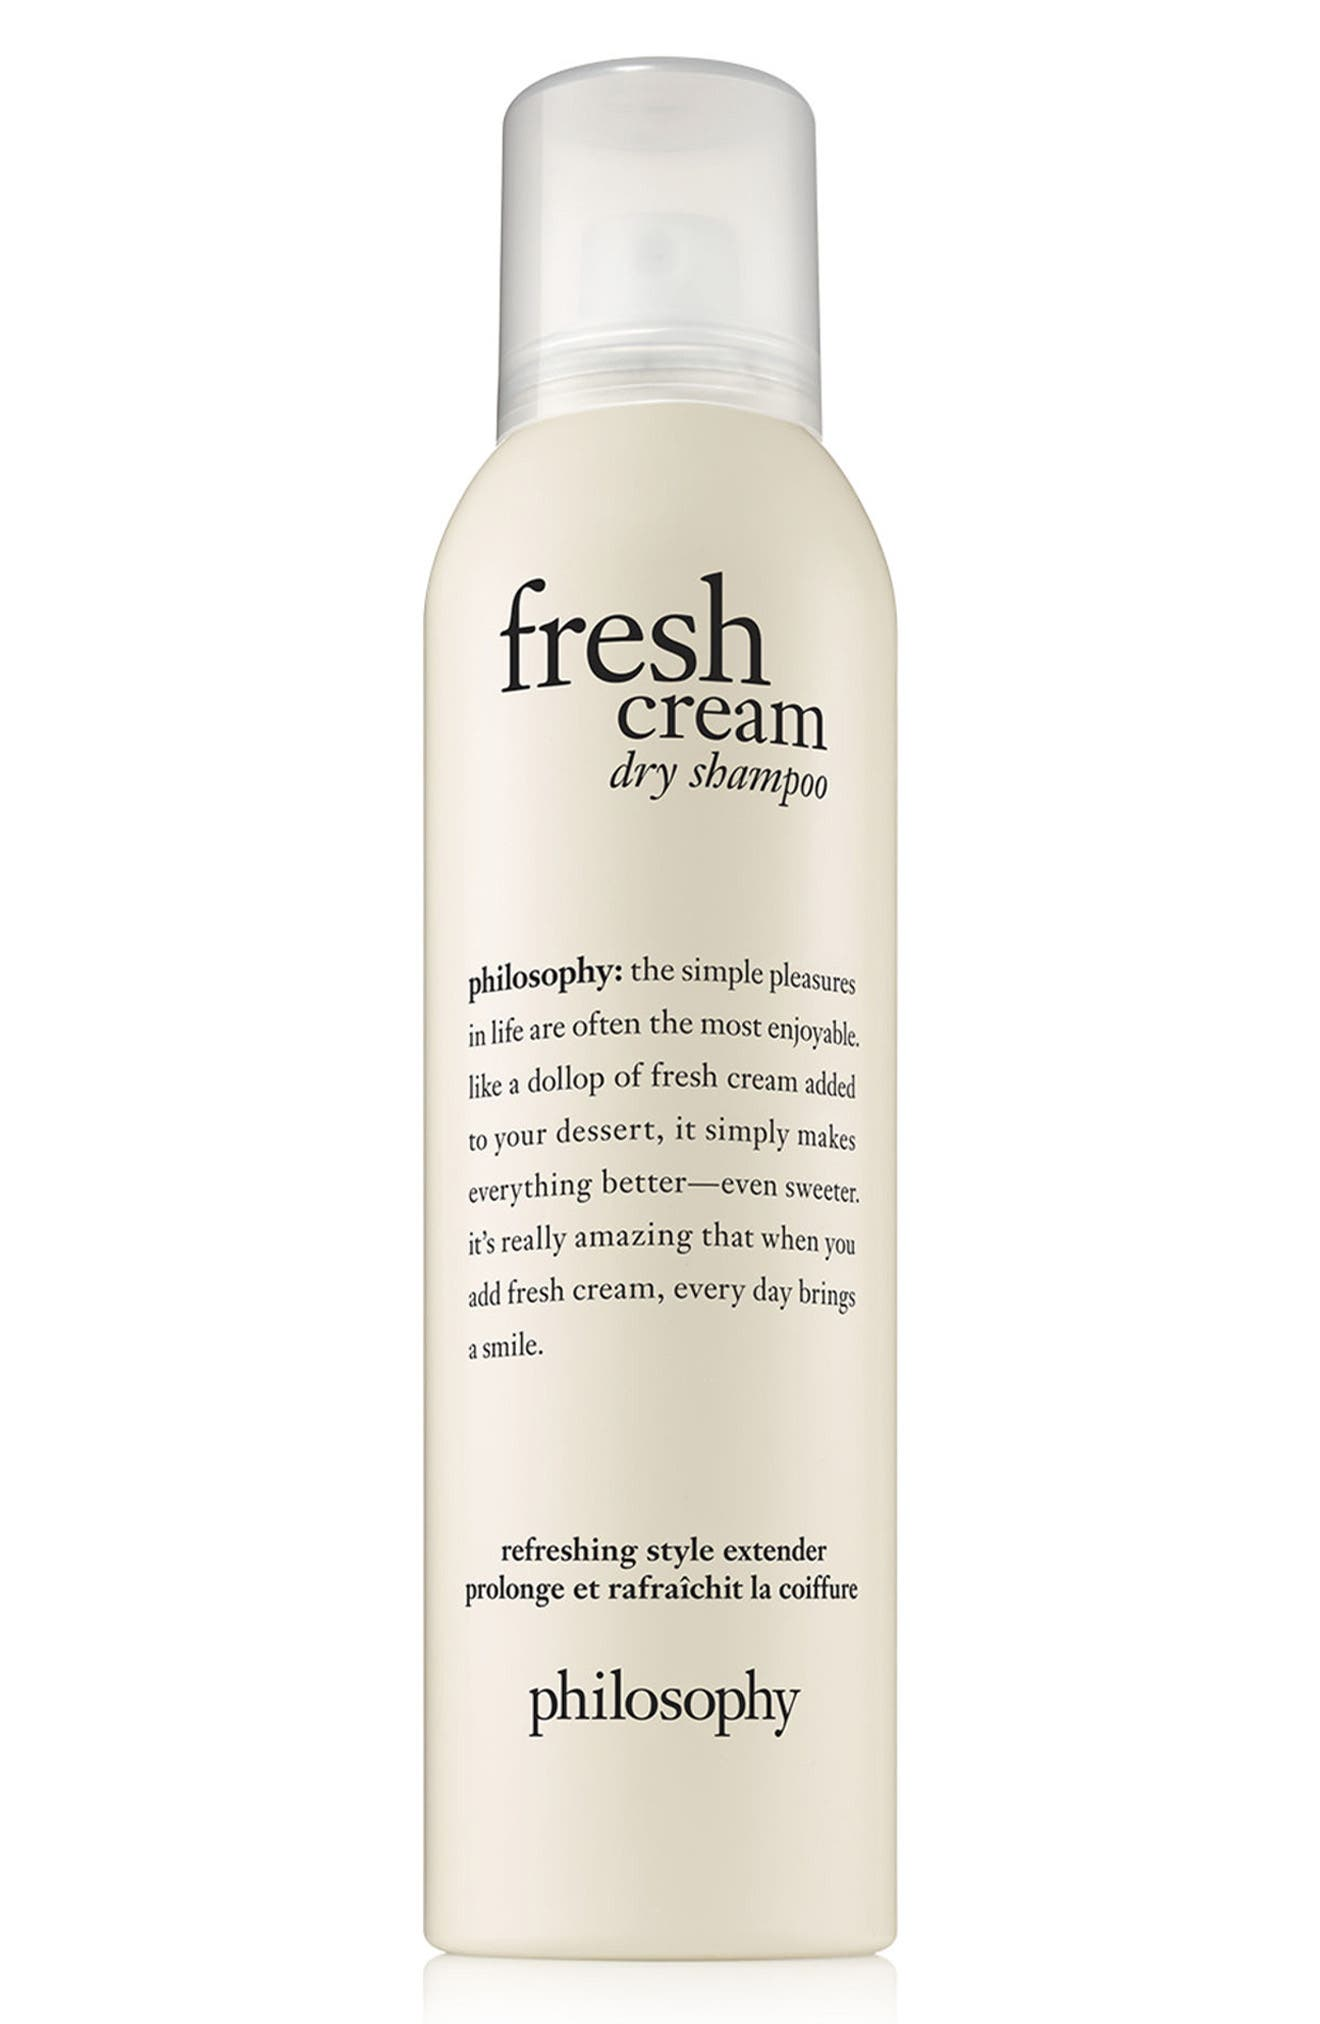 Alternate Image 1 Selected - philosophy fresh cream dry shampoo